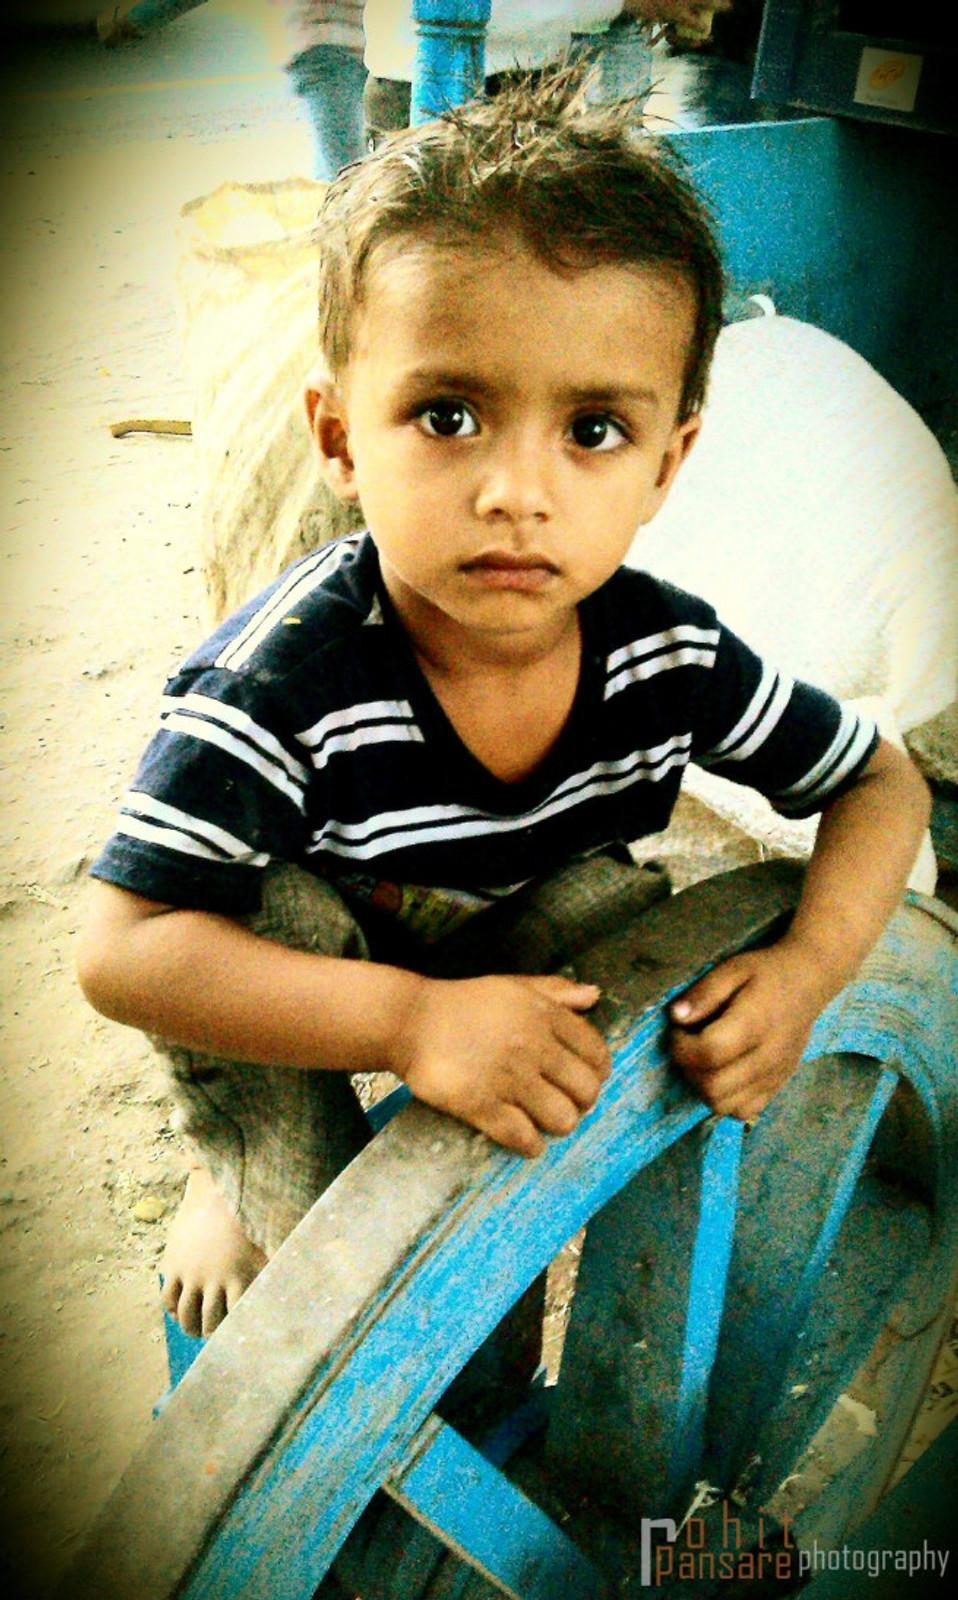 Children-at-play-rohit-pansare-photo